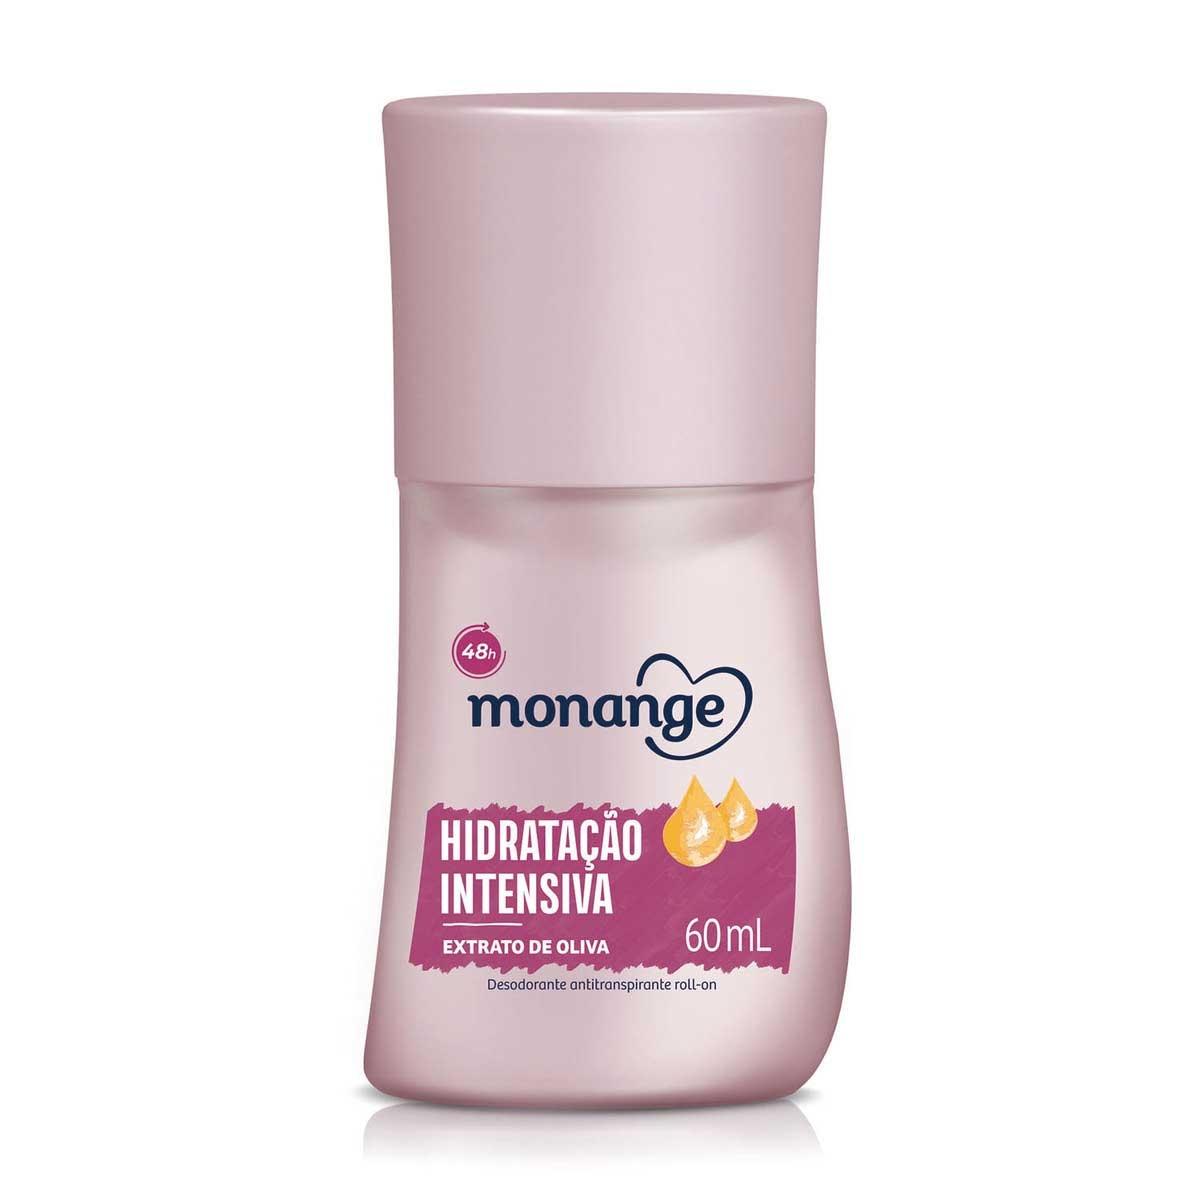 Desodorante Roll-On Monange Hidratação Intensiva com 60ml 60ml